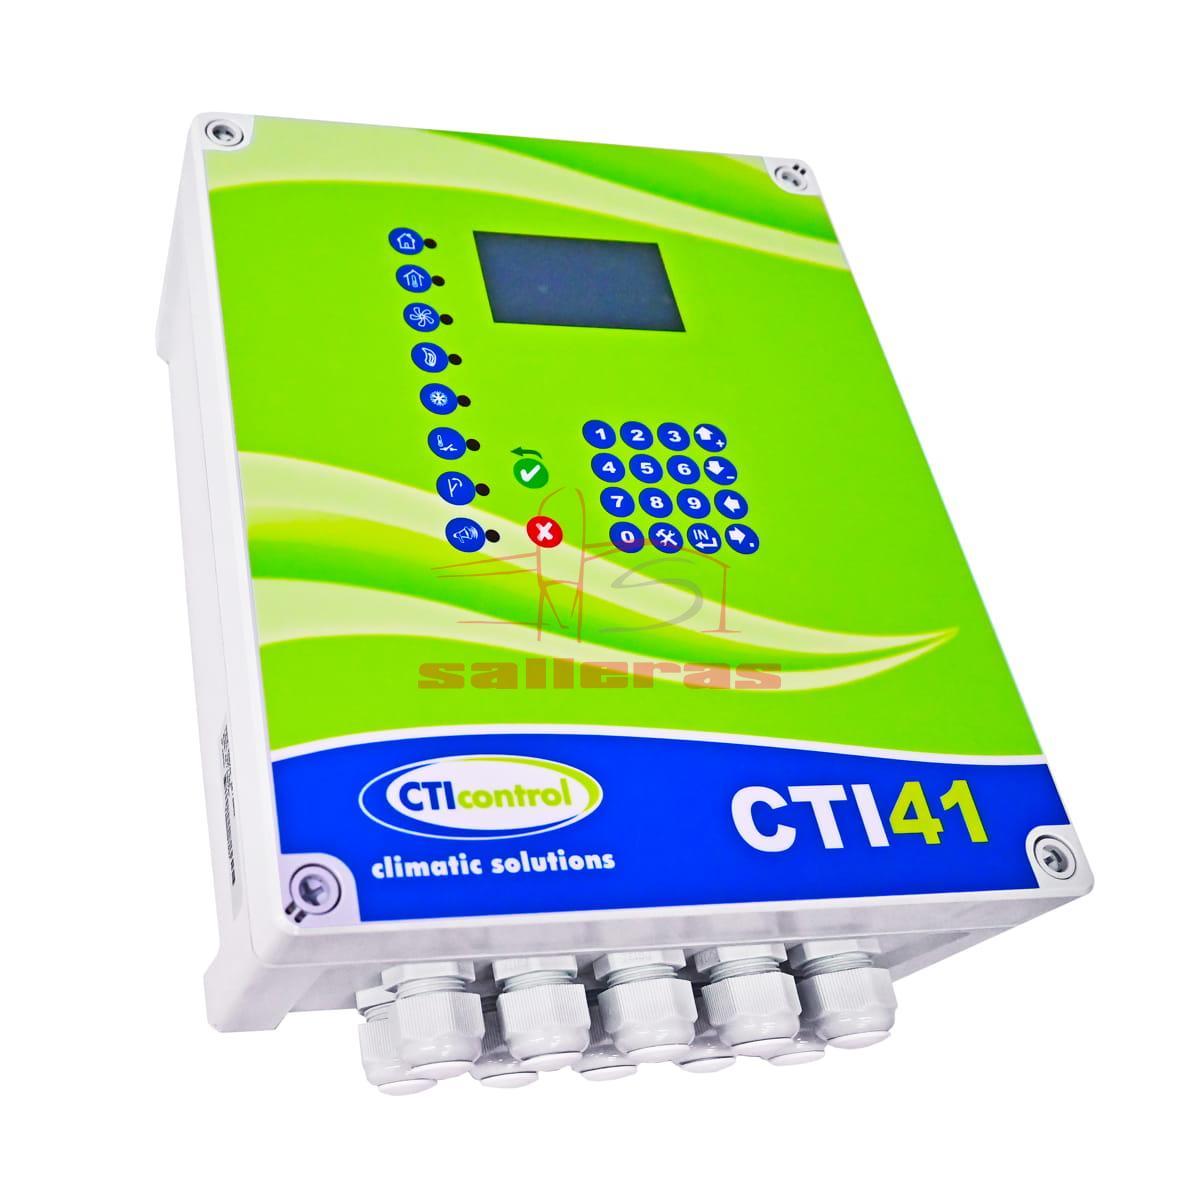 Regulador cti 41 25a verde reves